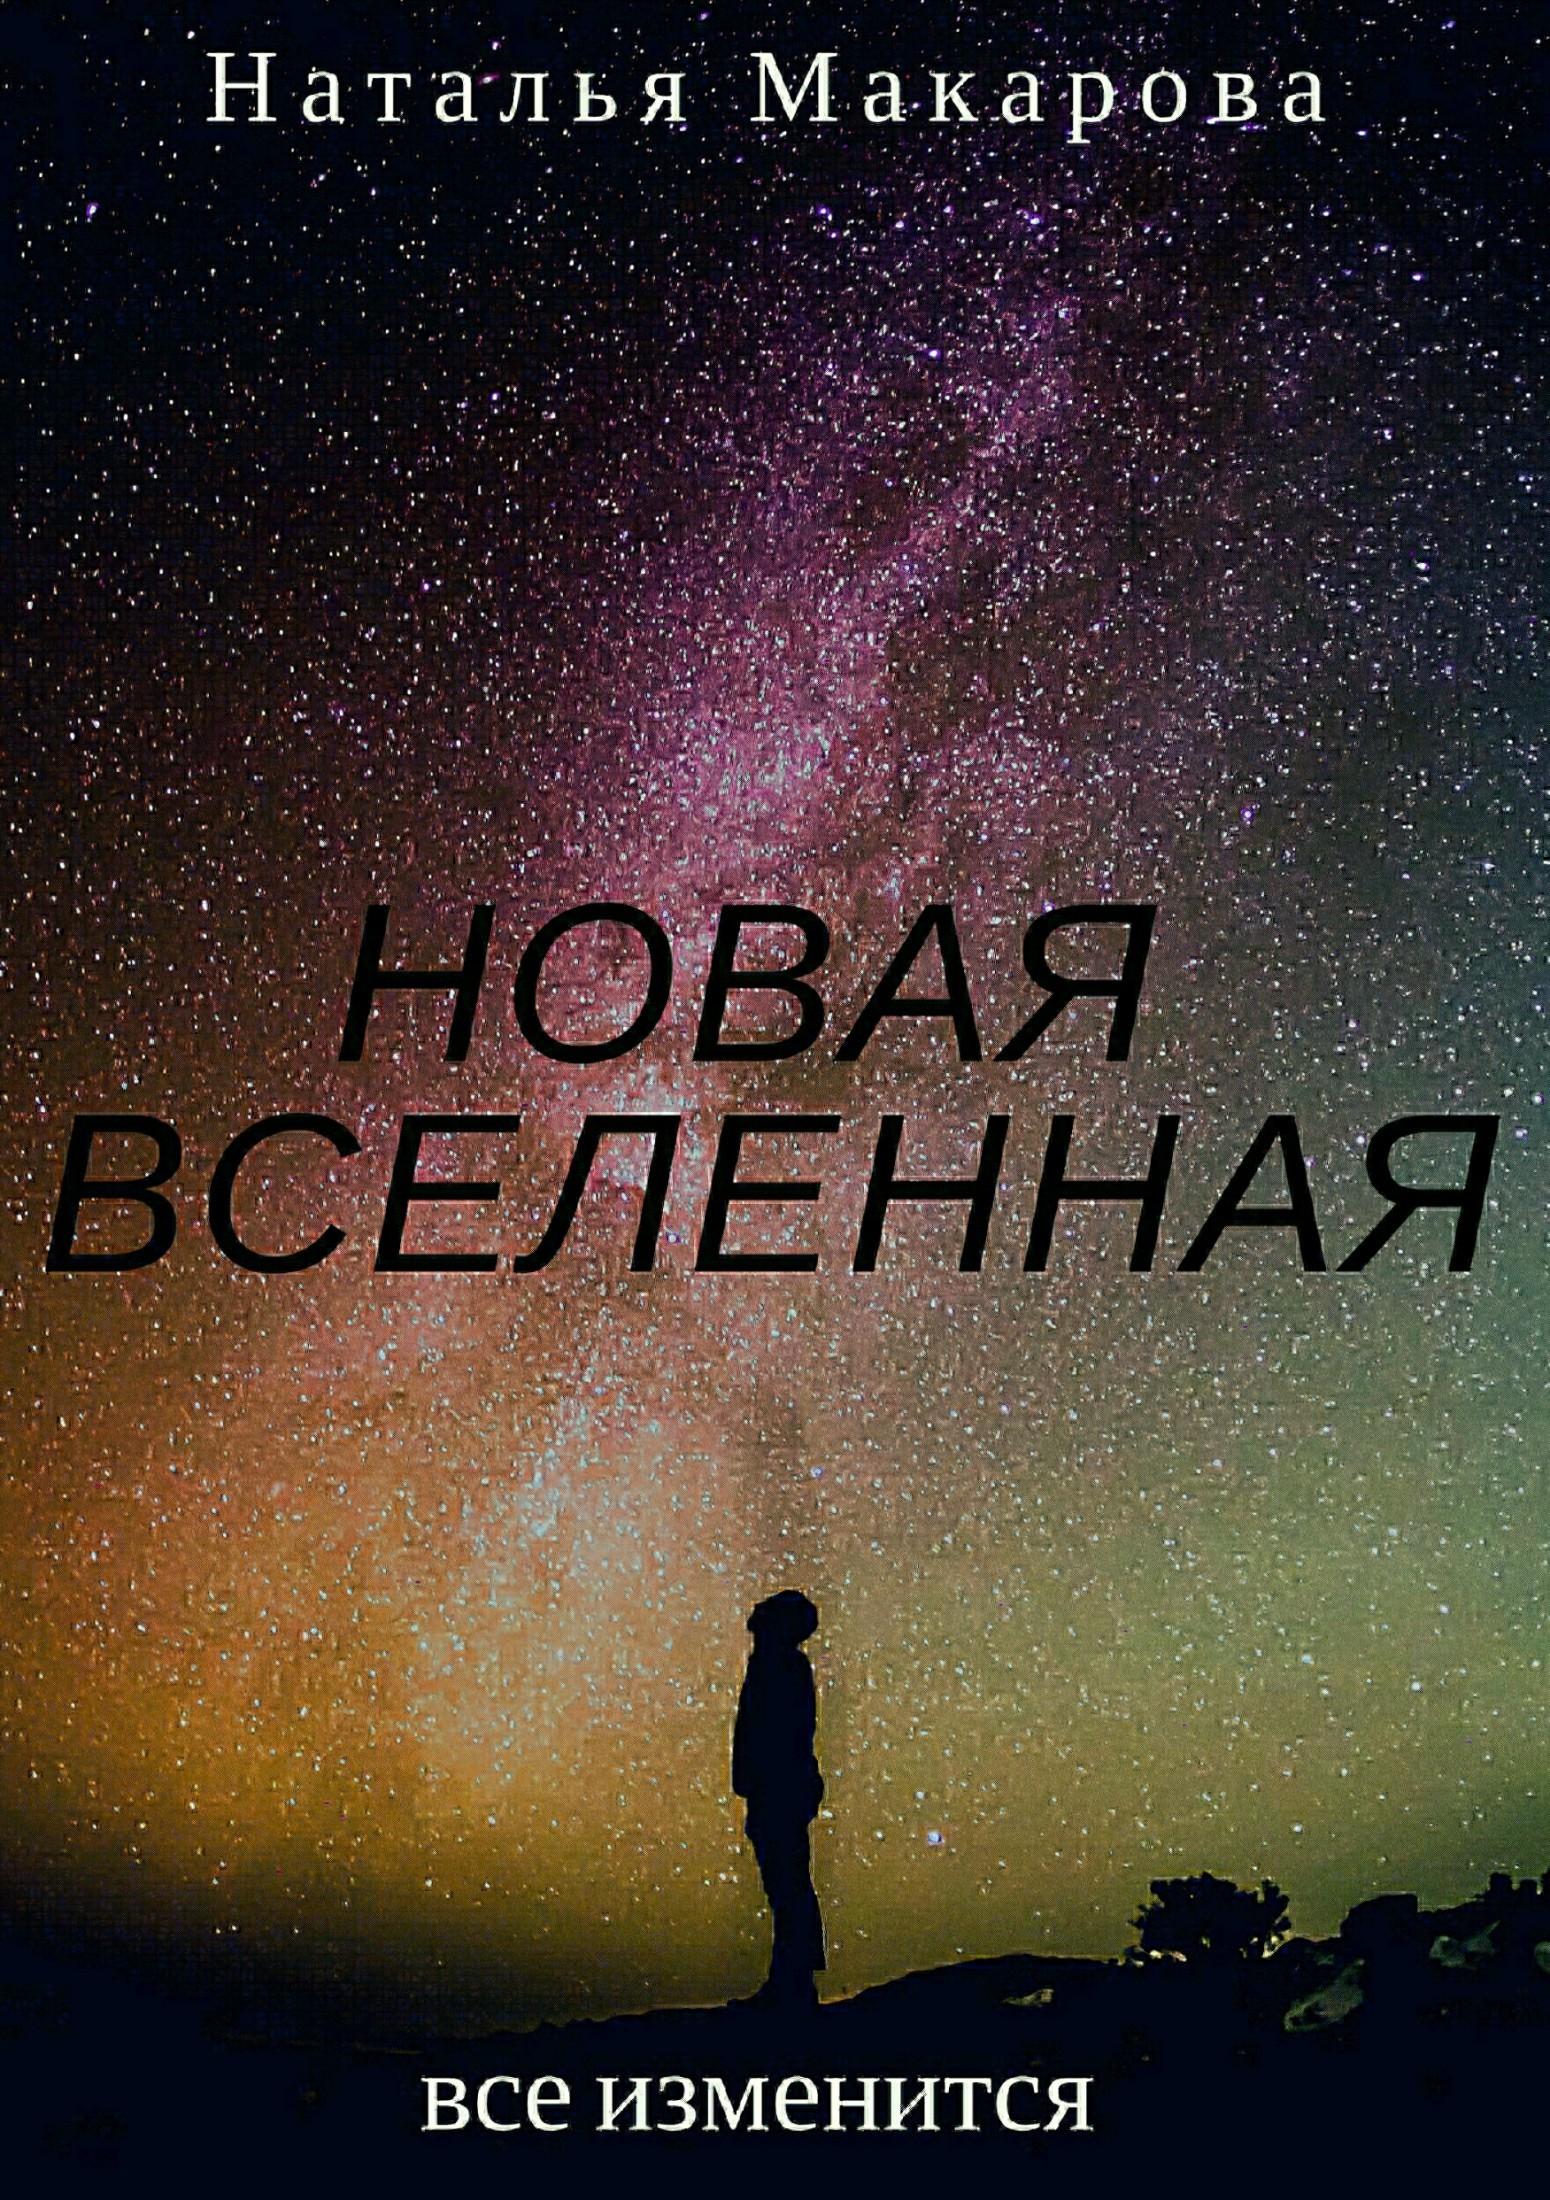 Шикарная заставка для романа 35/56/15/35561526.bin.dir/35561526.cover.jpg обложка